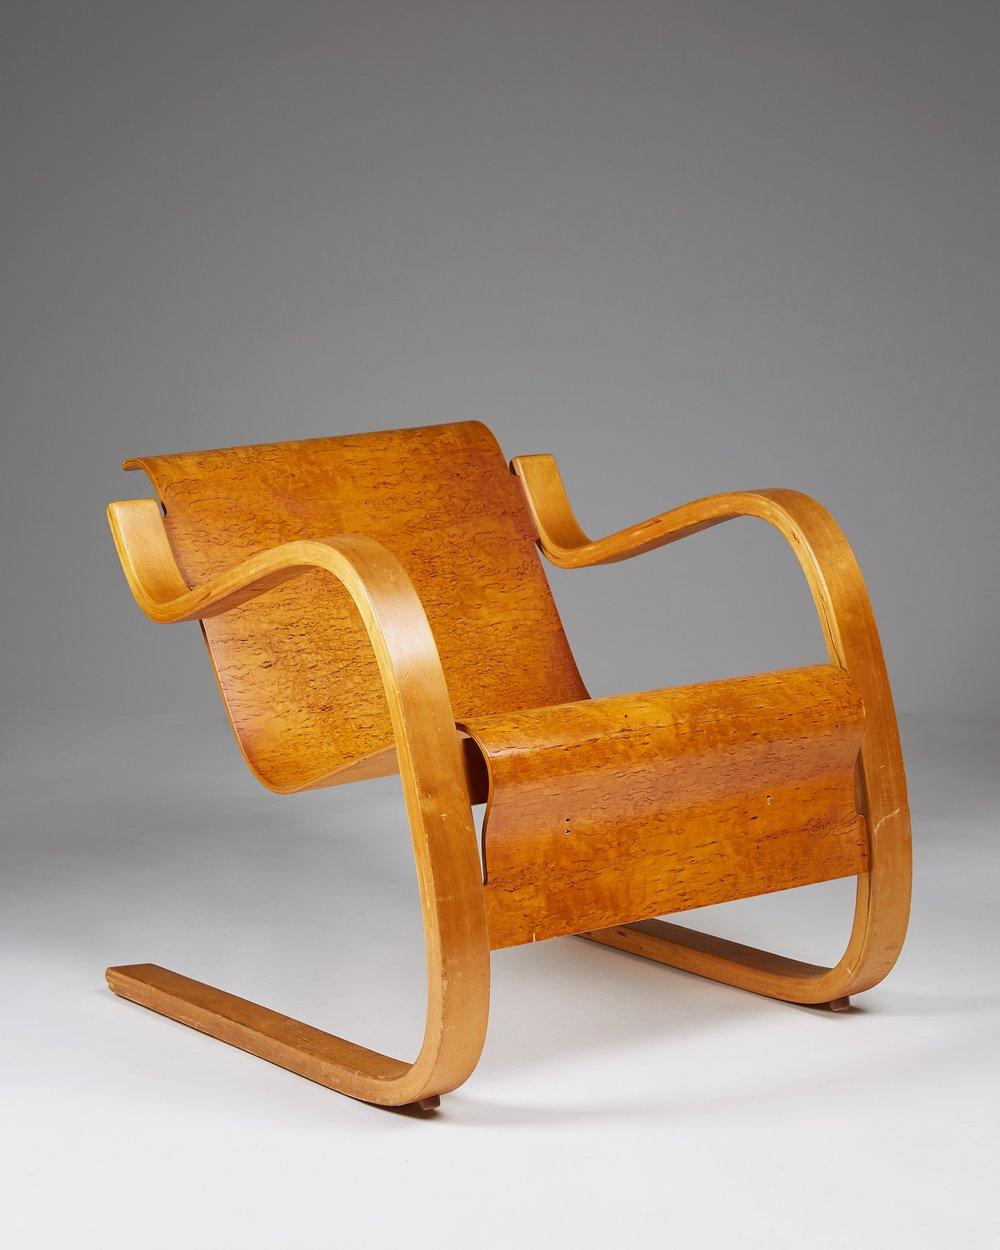 Alvar Aalto  Armchair number 31 Finland, 1931-1932 Birch and Karelian birch. 61 x 61 x 70 cm Seat: from 36 to 24 cm